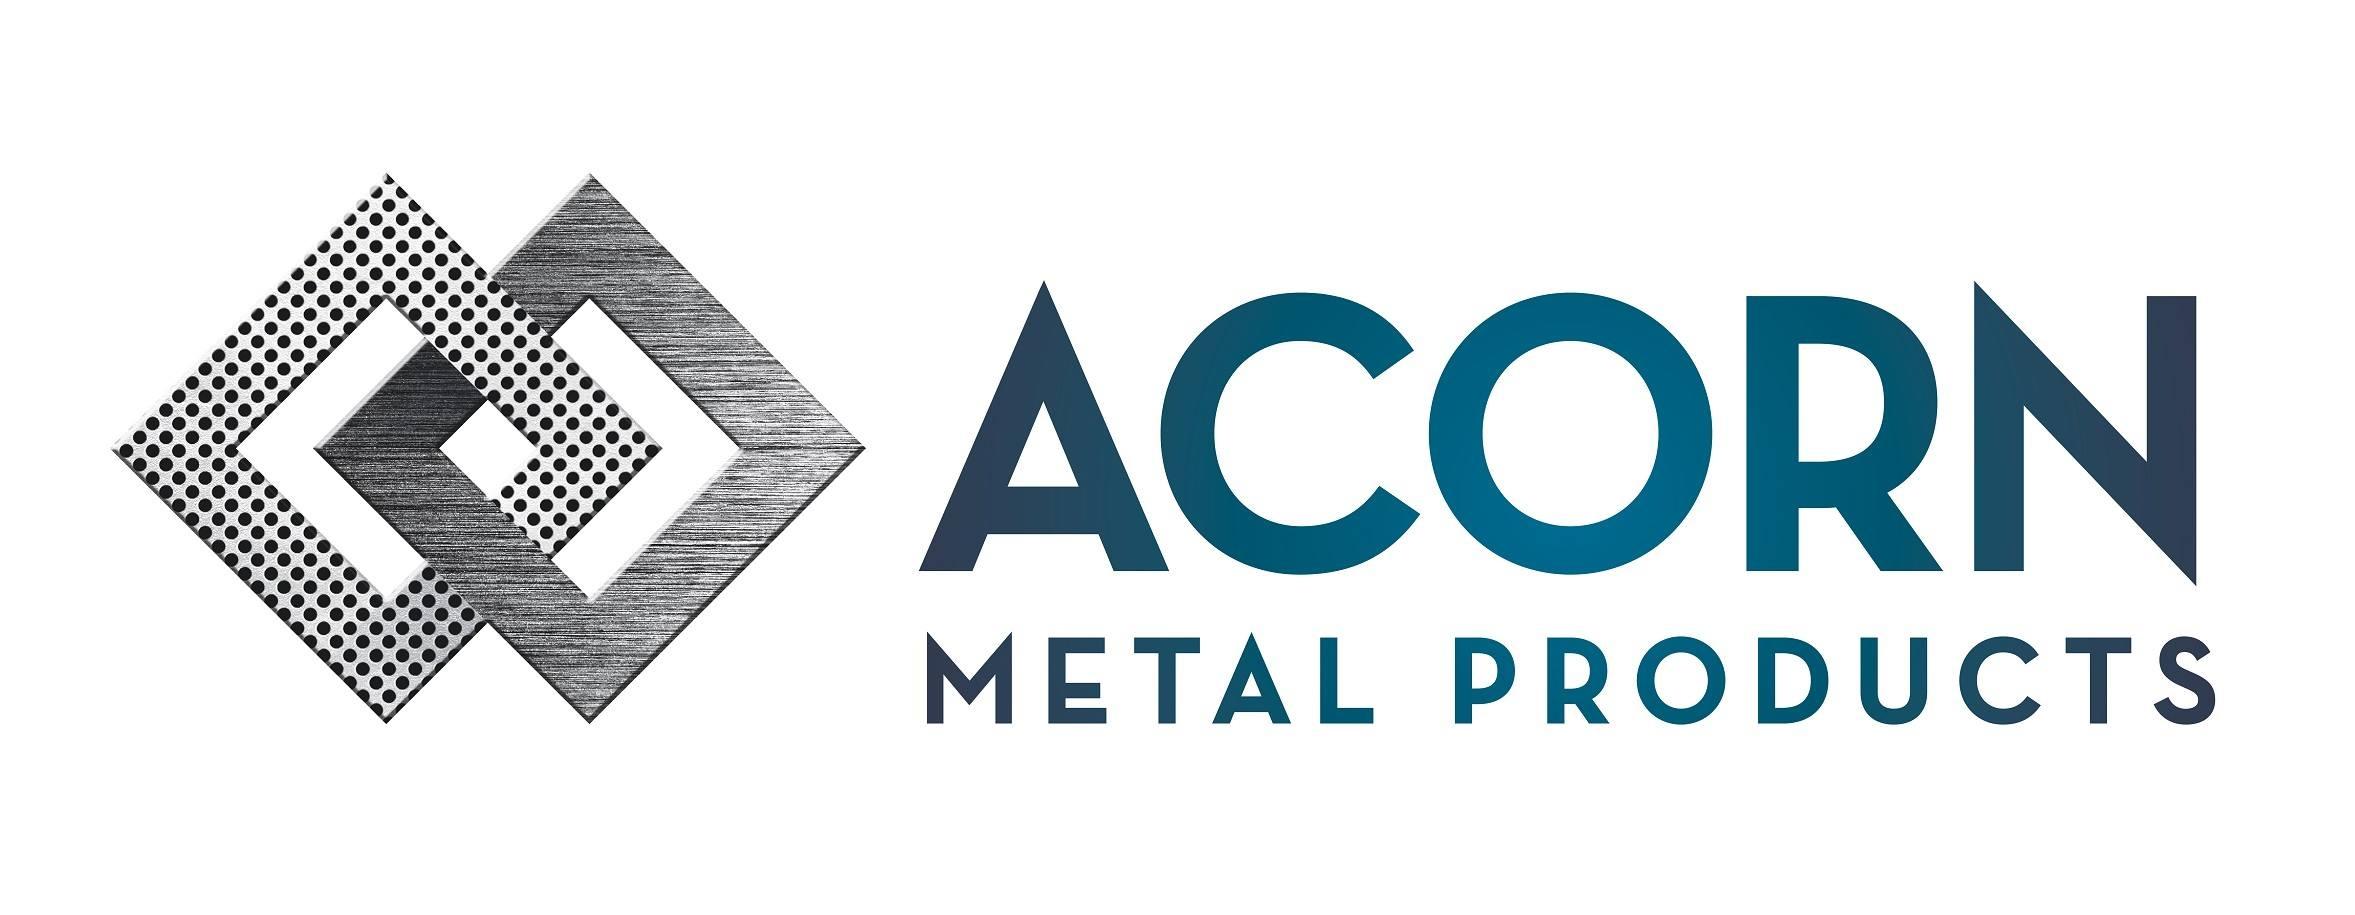 Acorn Metal Products Pty Ltd (@acornmetals) Cover Image